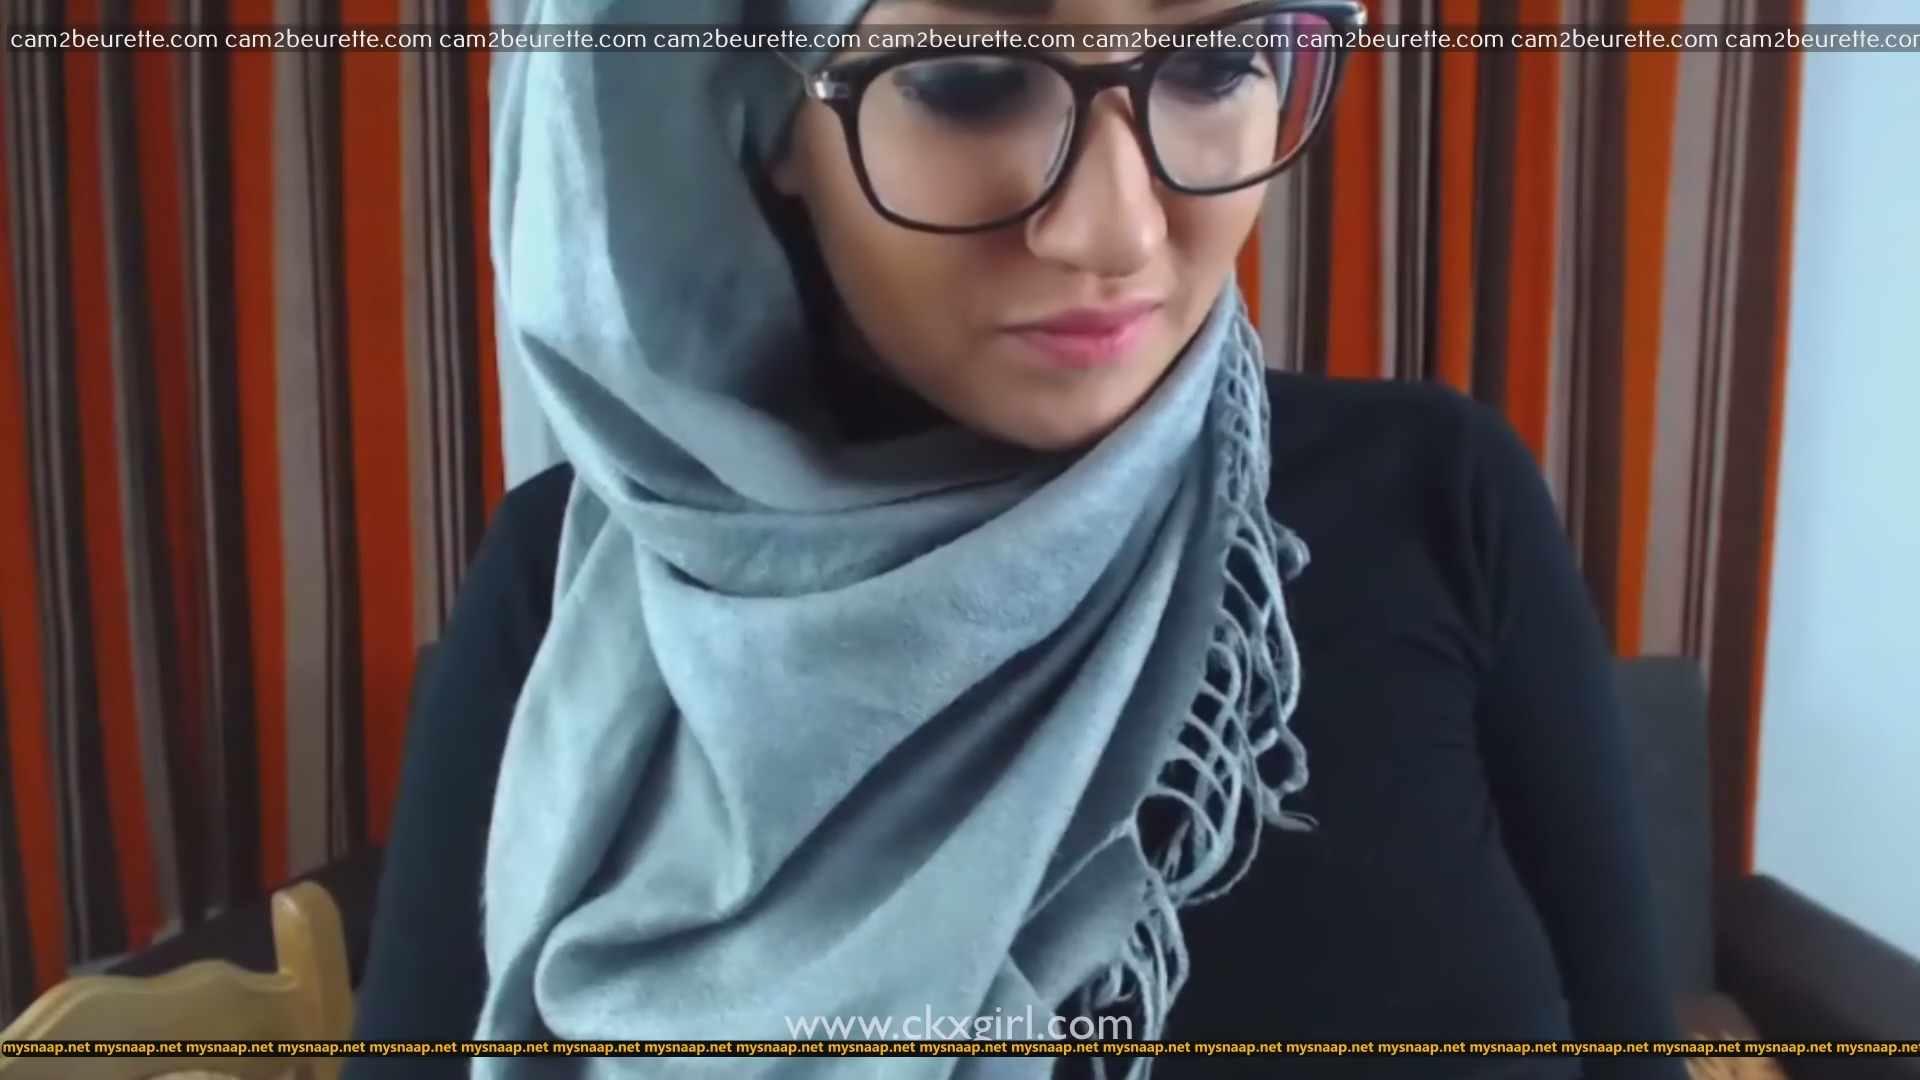 Camgirl voilée fait des coquinerie nue Munamuslim MunaSanur